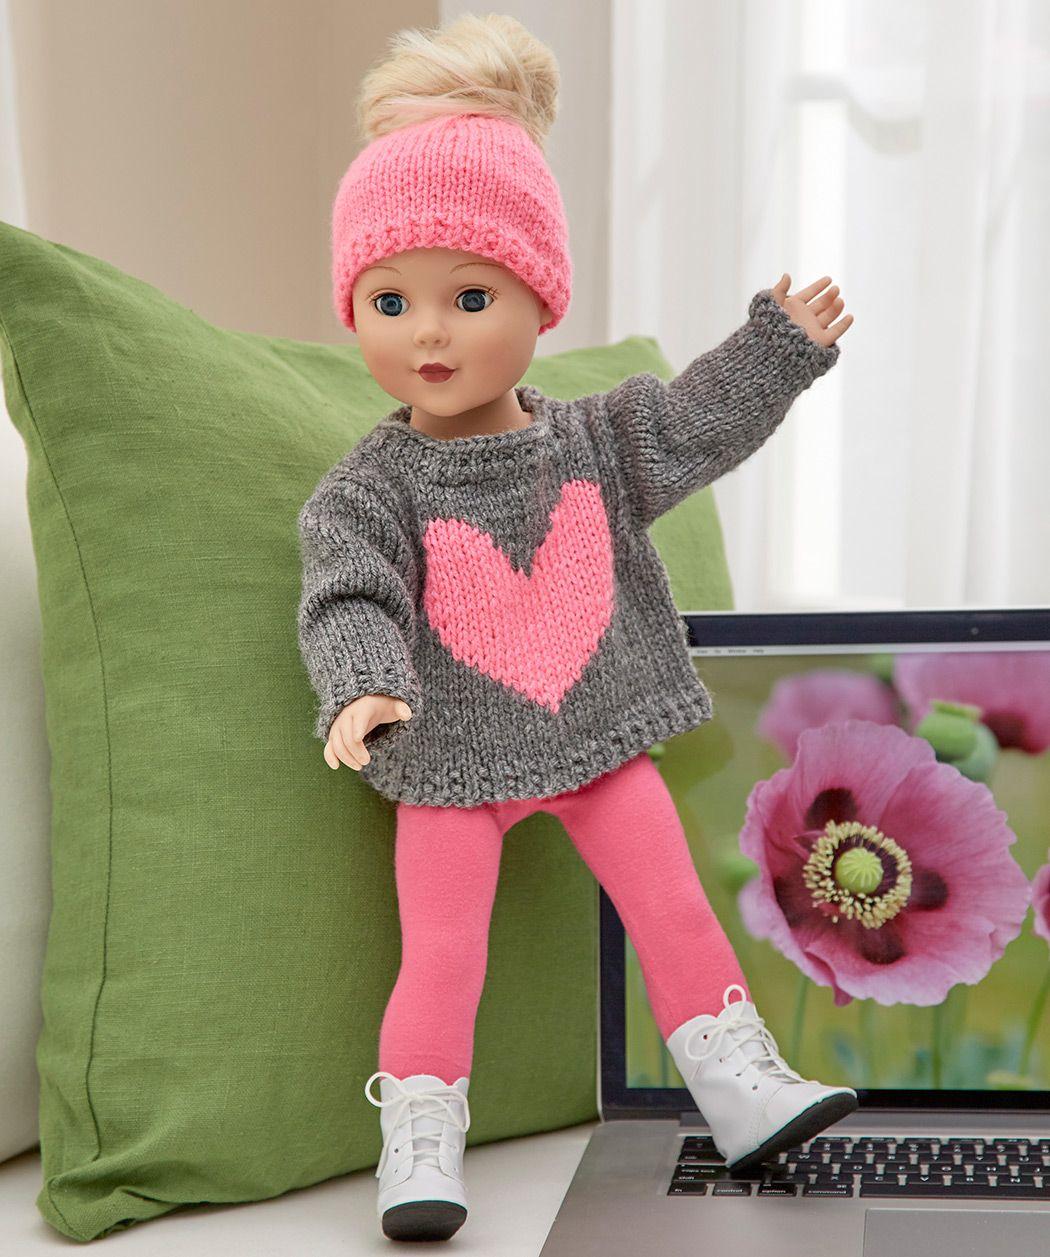 Dress Your 18-inch Doll | Red Heart | Alyssa\'s Stuff | Pinterest ...